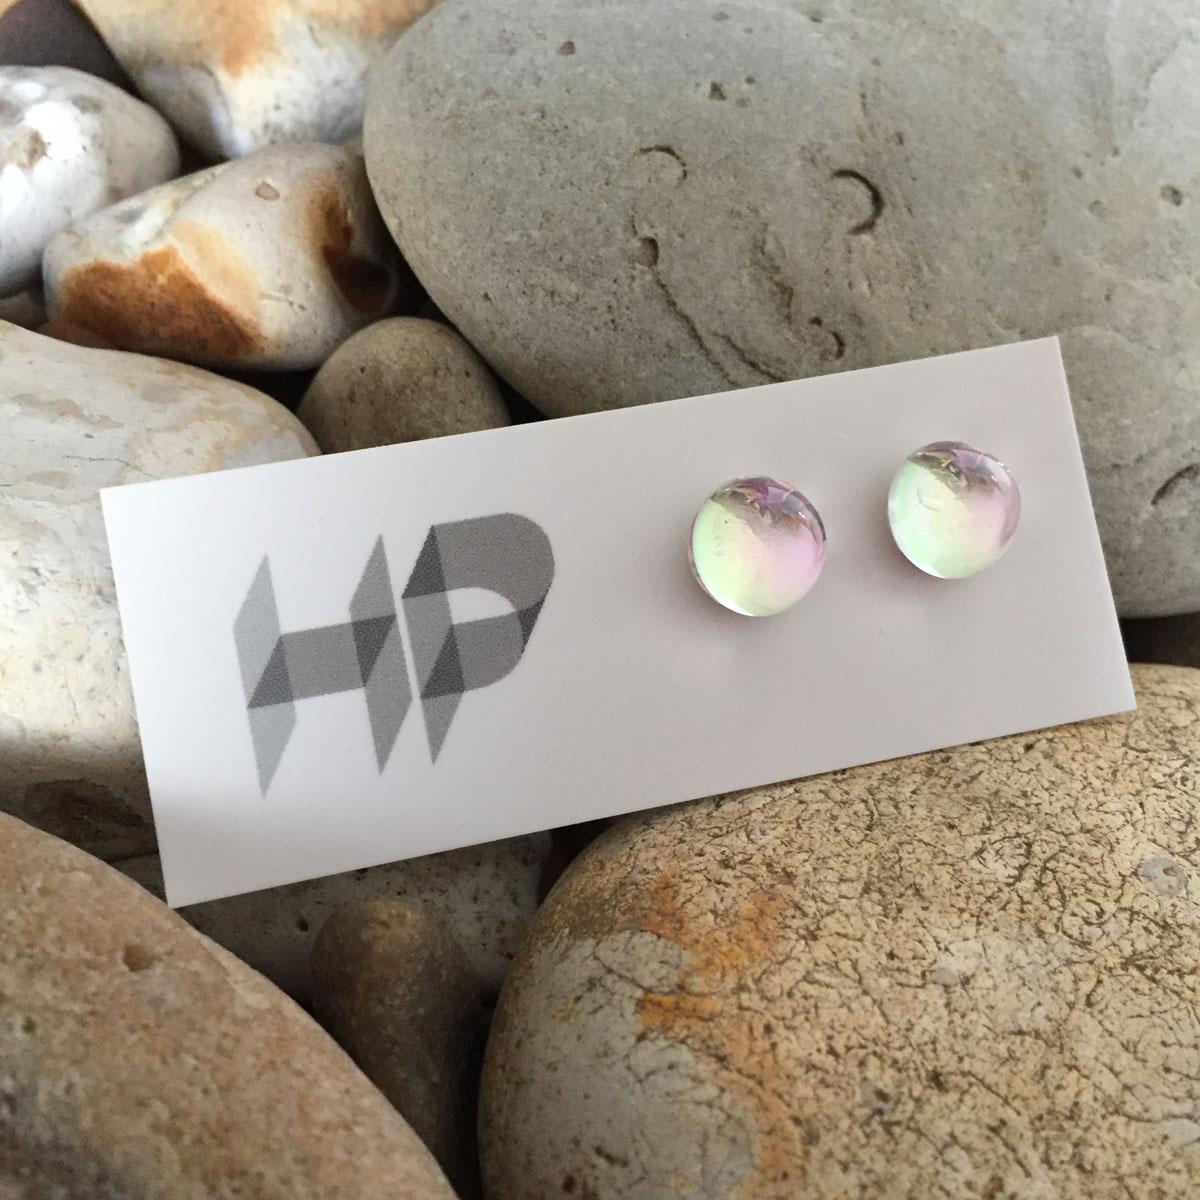 PAX352, Dazzle - Round Semispherical Stud Earrings